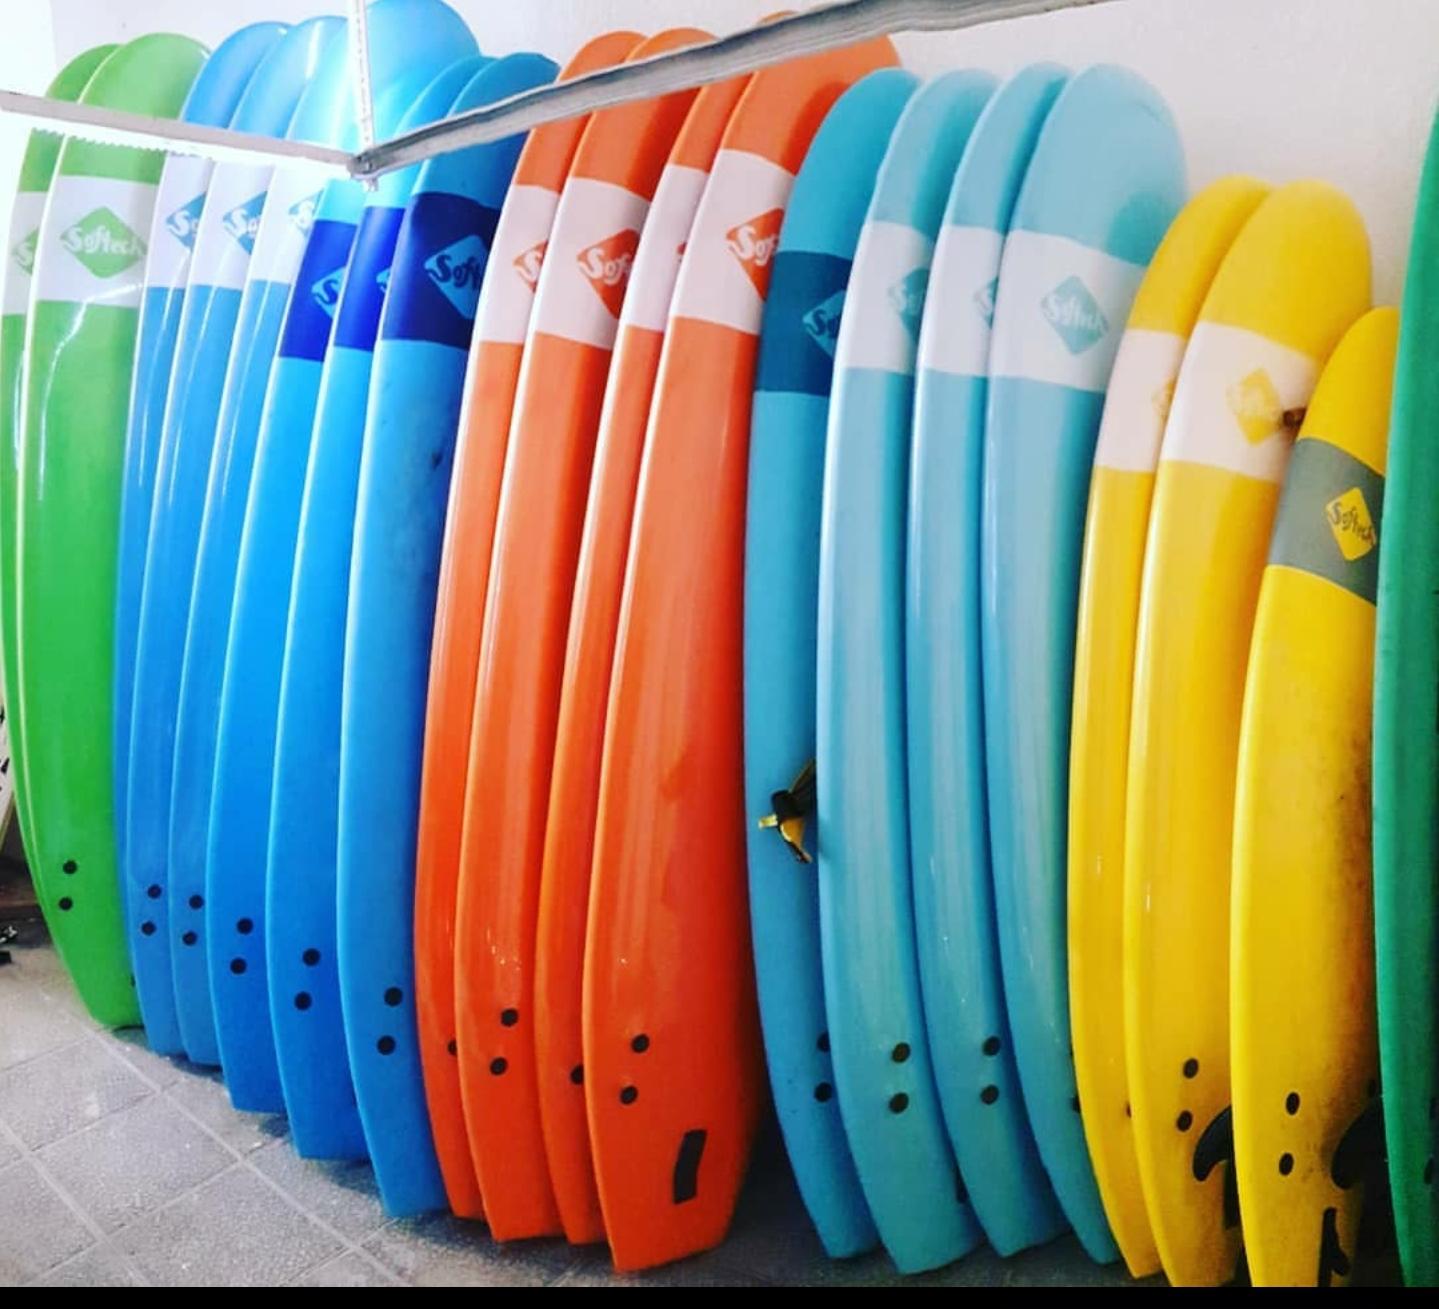 Alquiler Surf 1 Semana ESPECIAL FASE 0 Soft Board